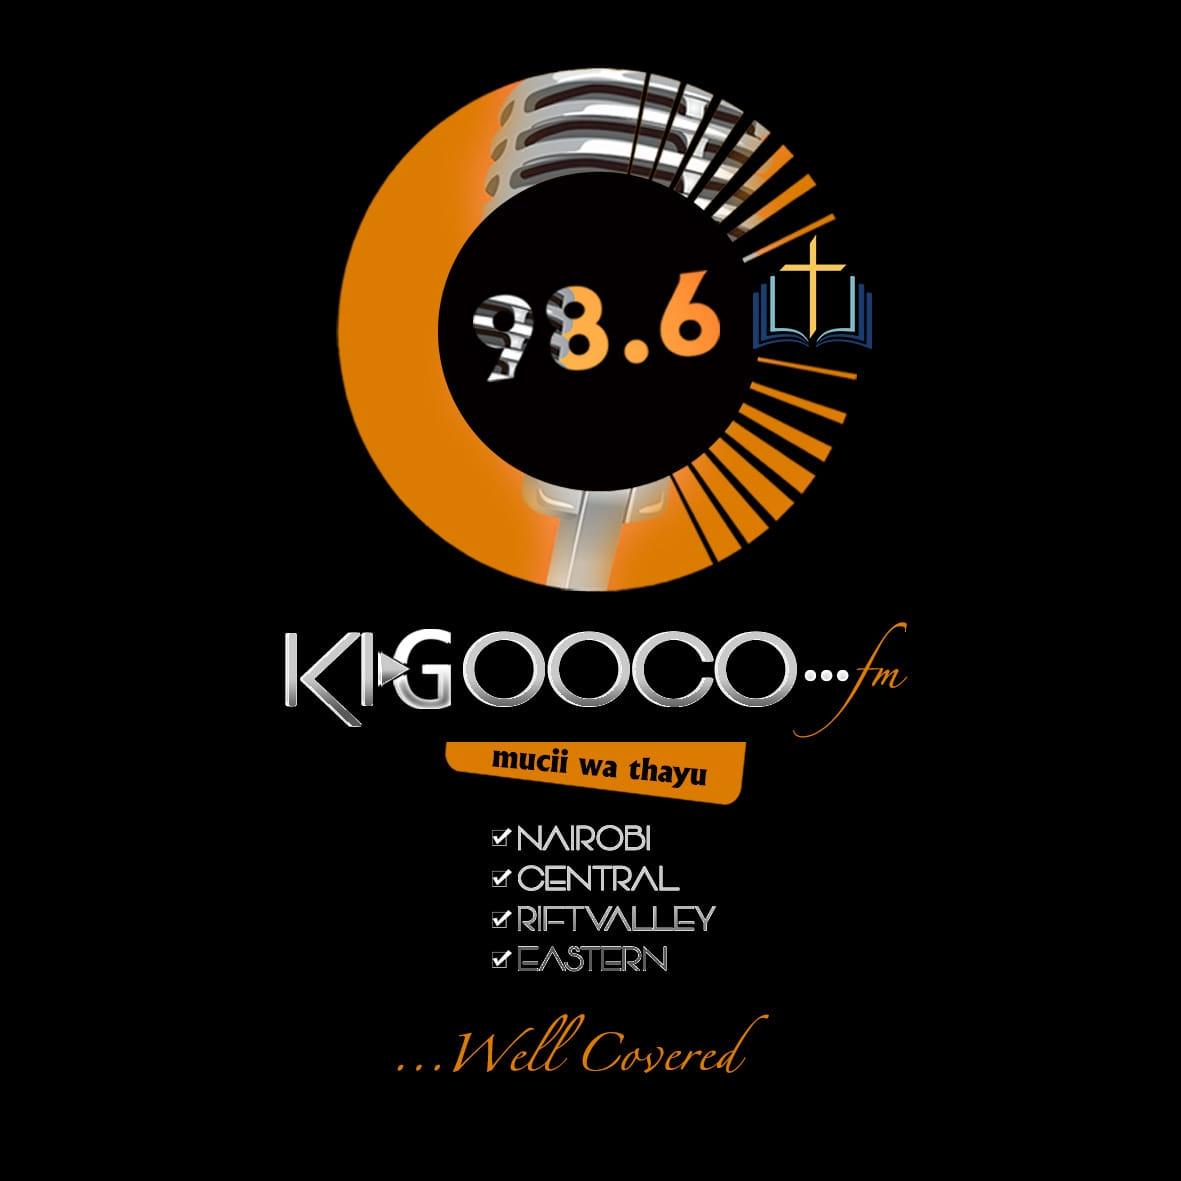 Kigooco FM